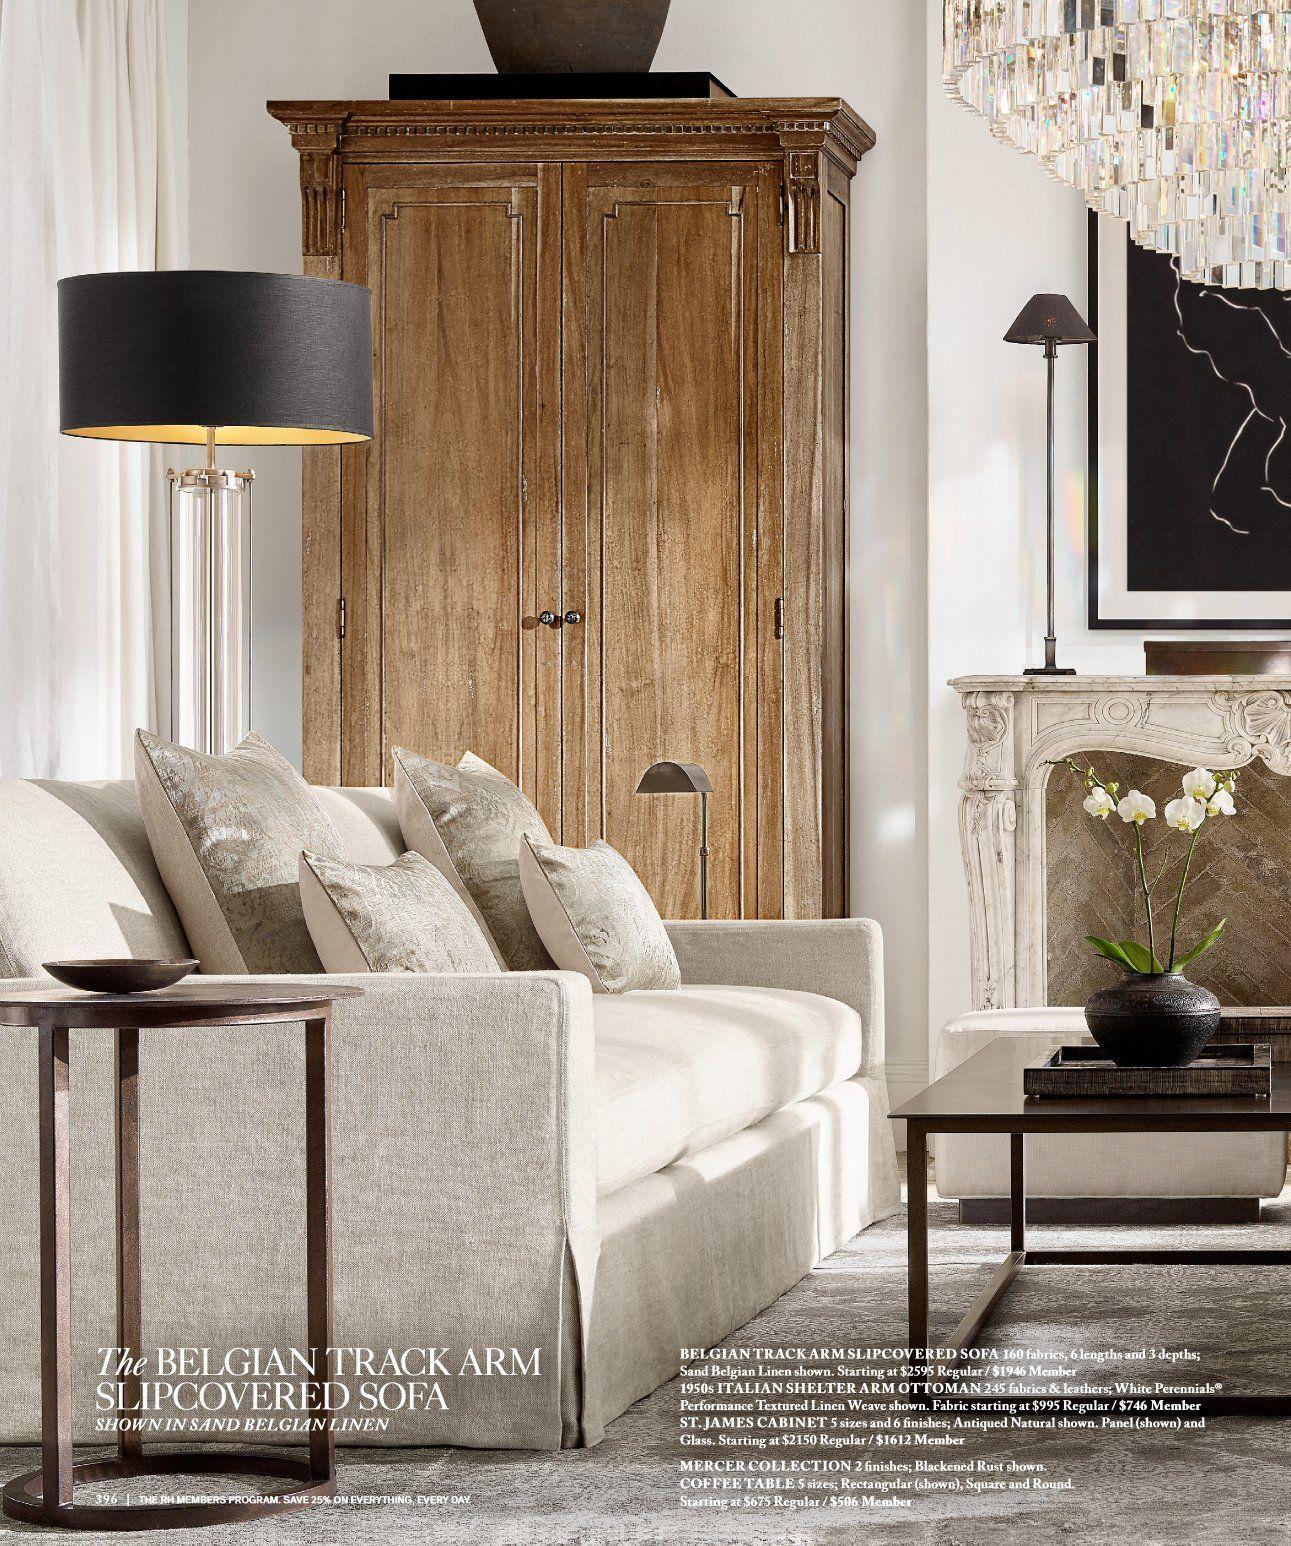 Rh Source Books Rh Interiors 396 Living Room Designs House Interior Home Decor